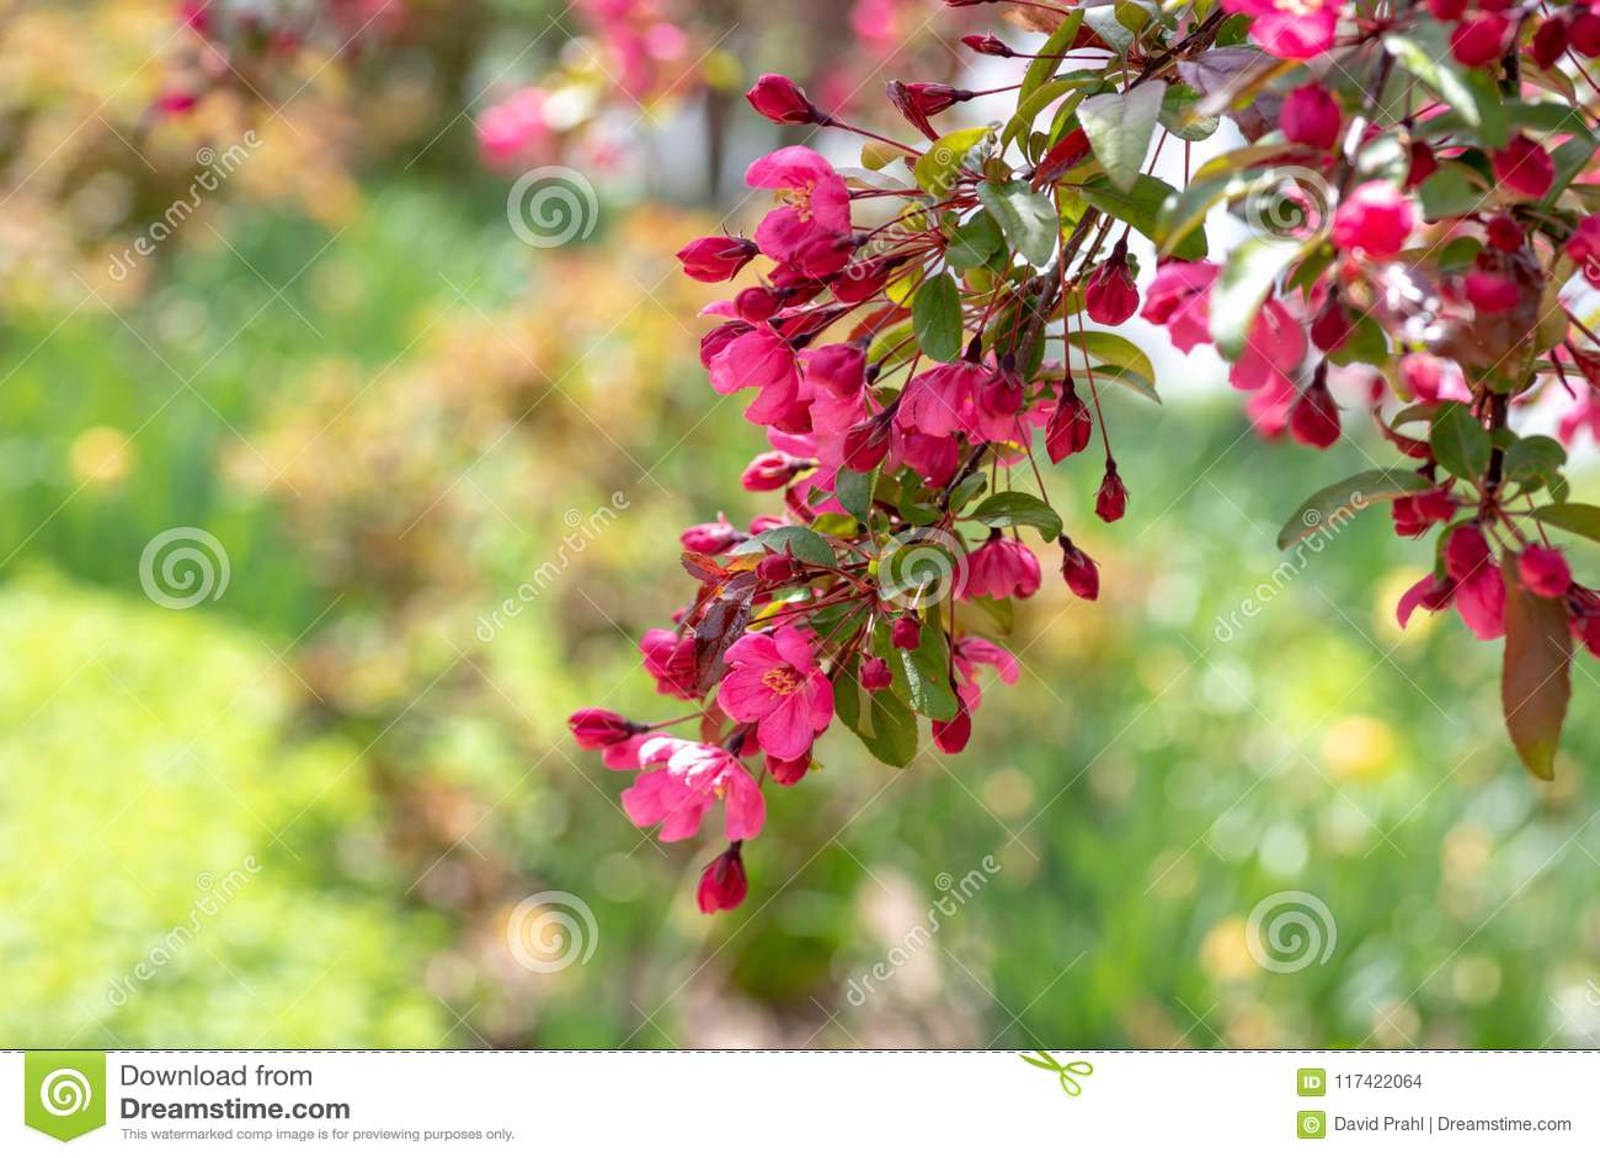 Pink Prarifire Crabapple Tree Flowers Blooming In Spring Stock Photo